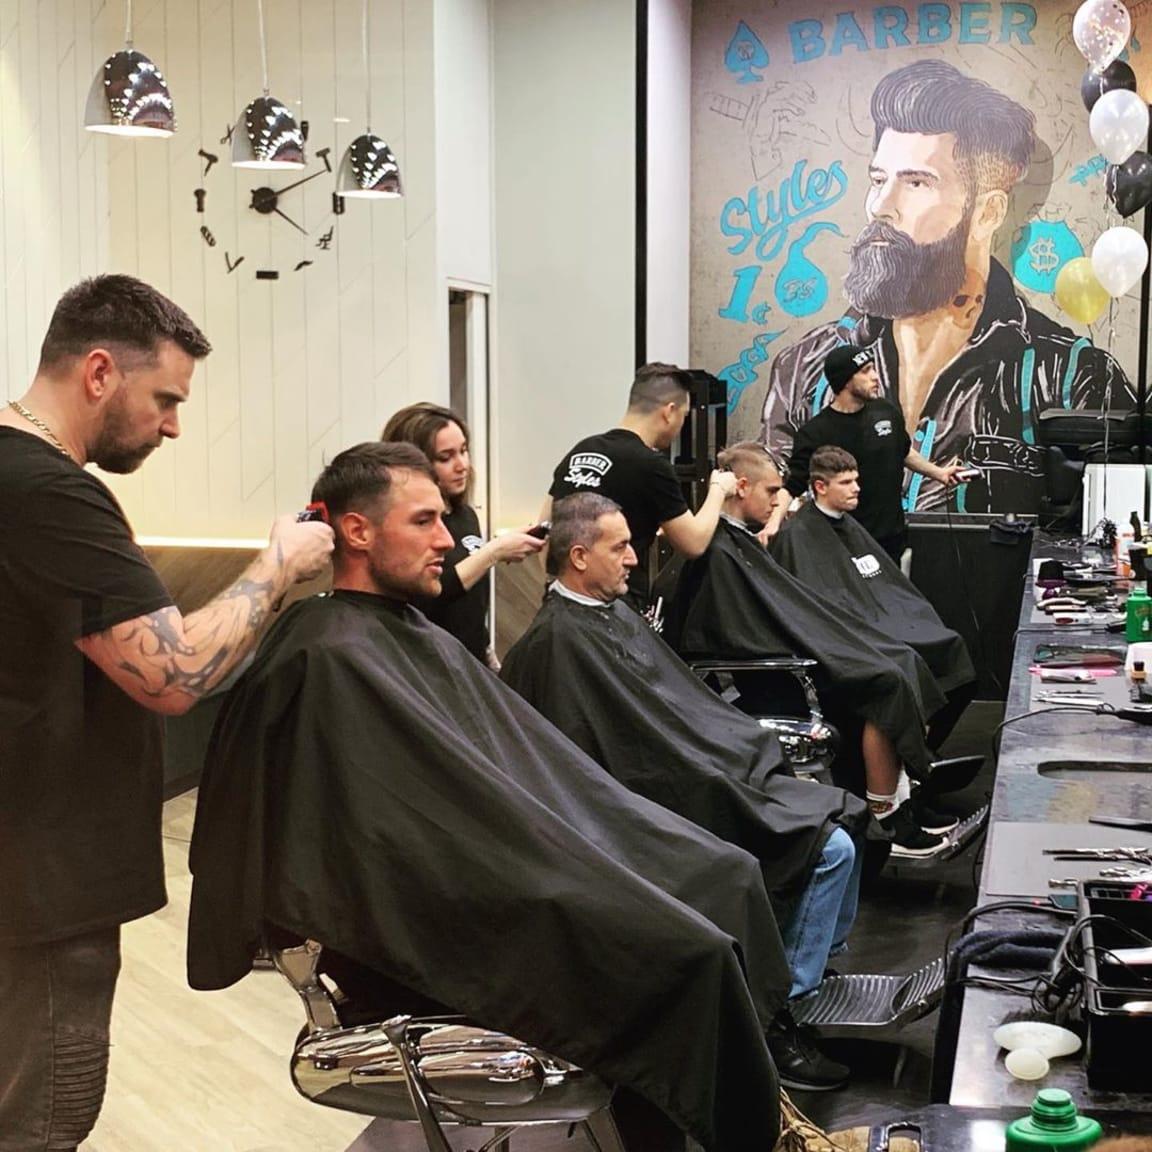 Barber Styles: $25 haircuts